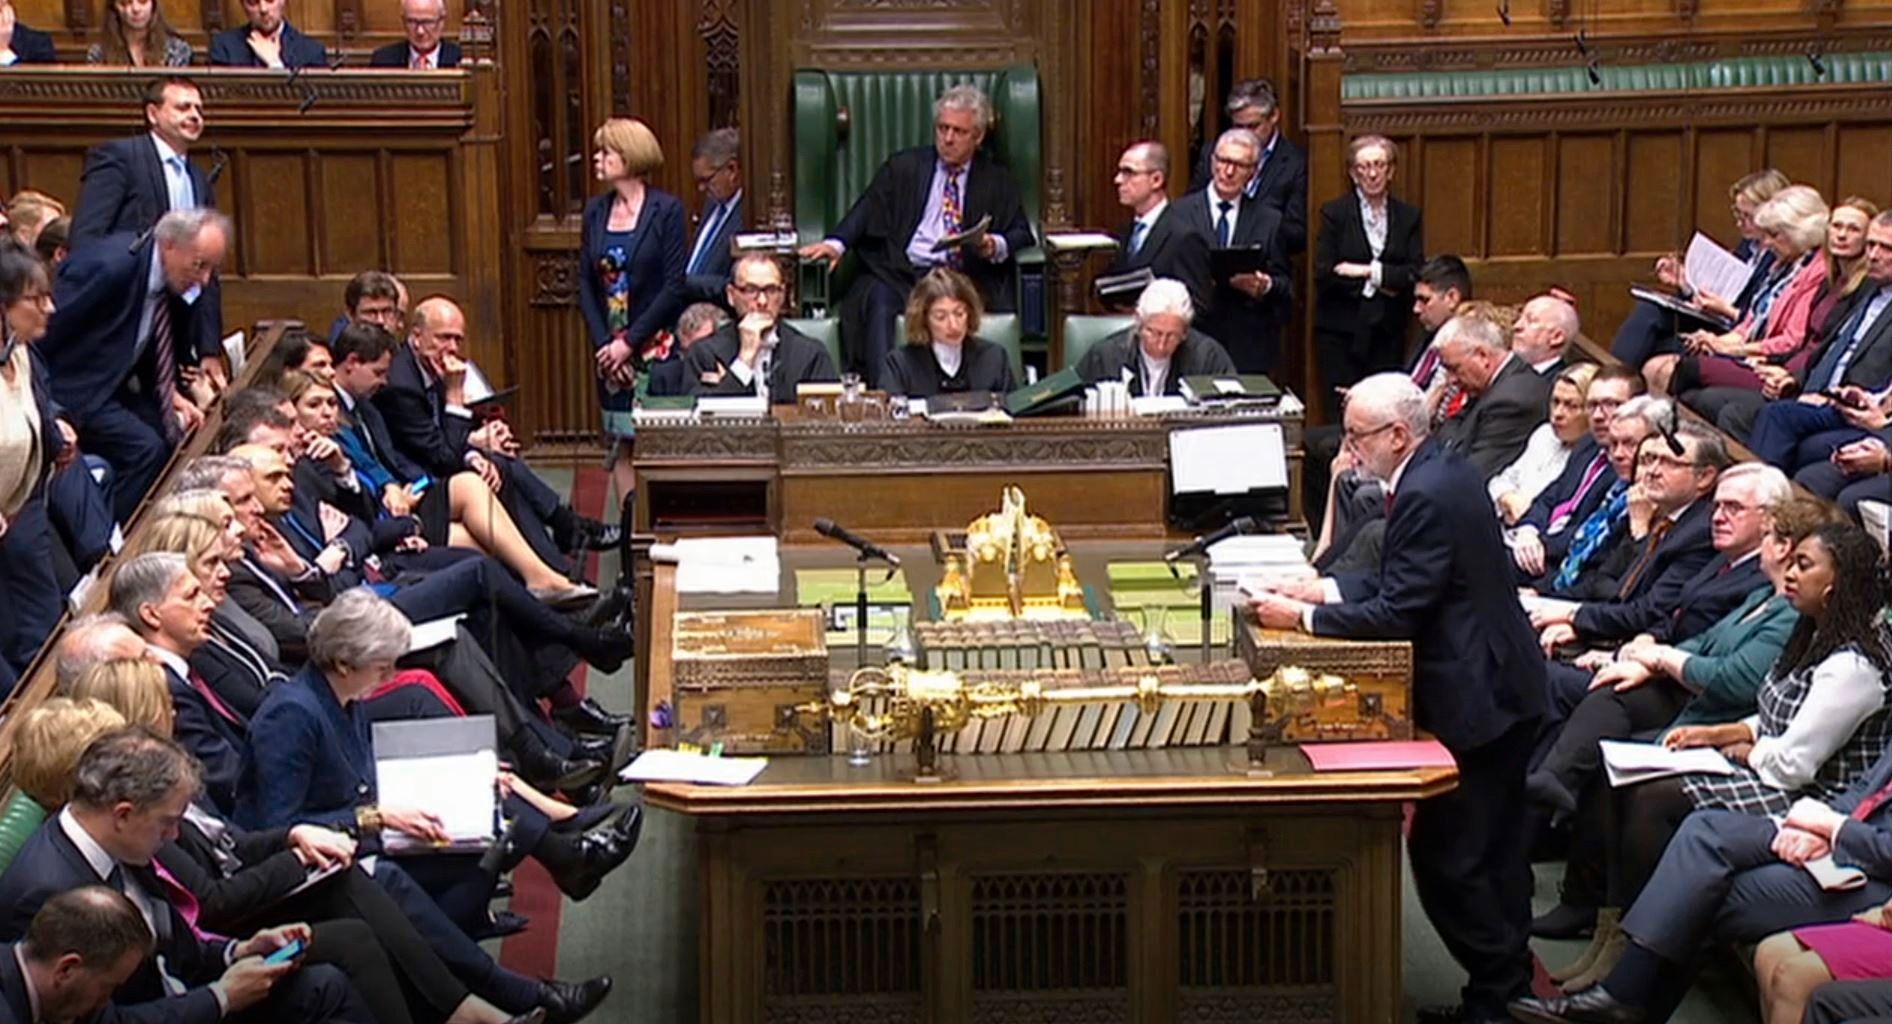 Labour-leder Jeremy Corbyn under statsminister Theresa Mays spørretime i Underhuset 1. mai.